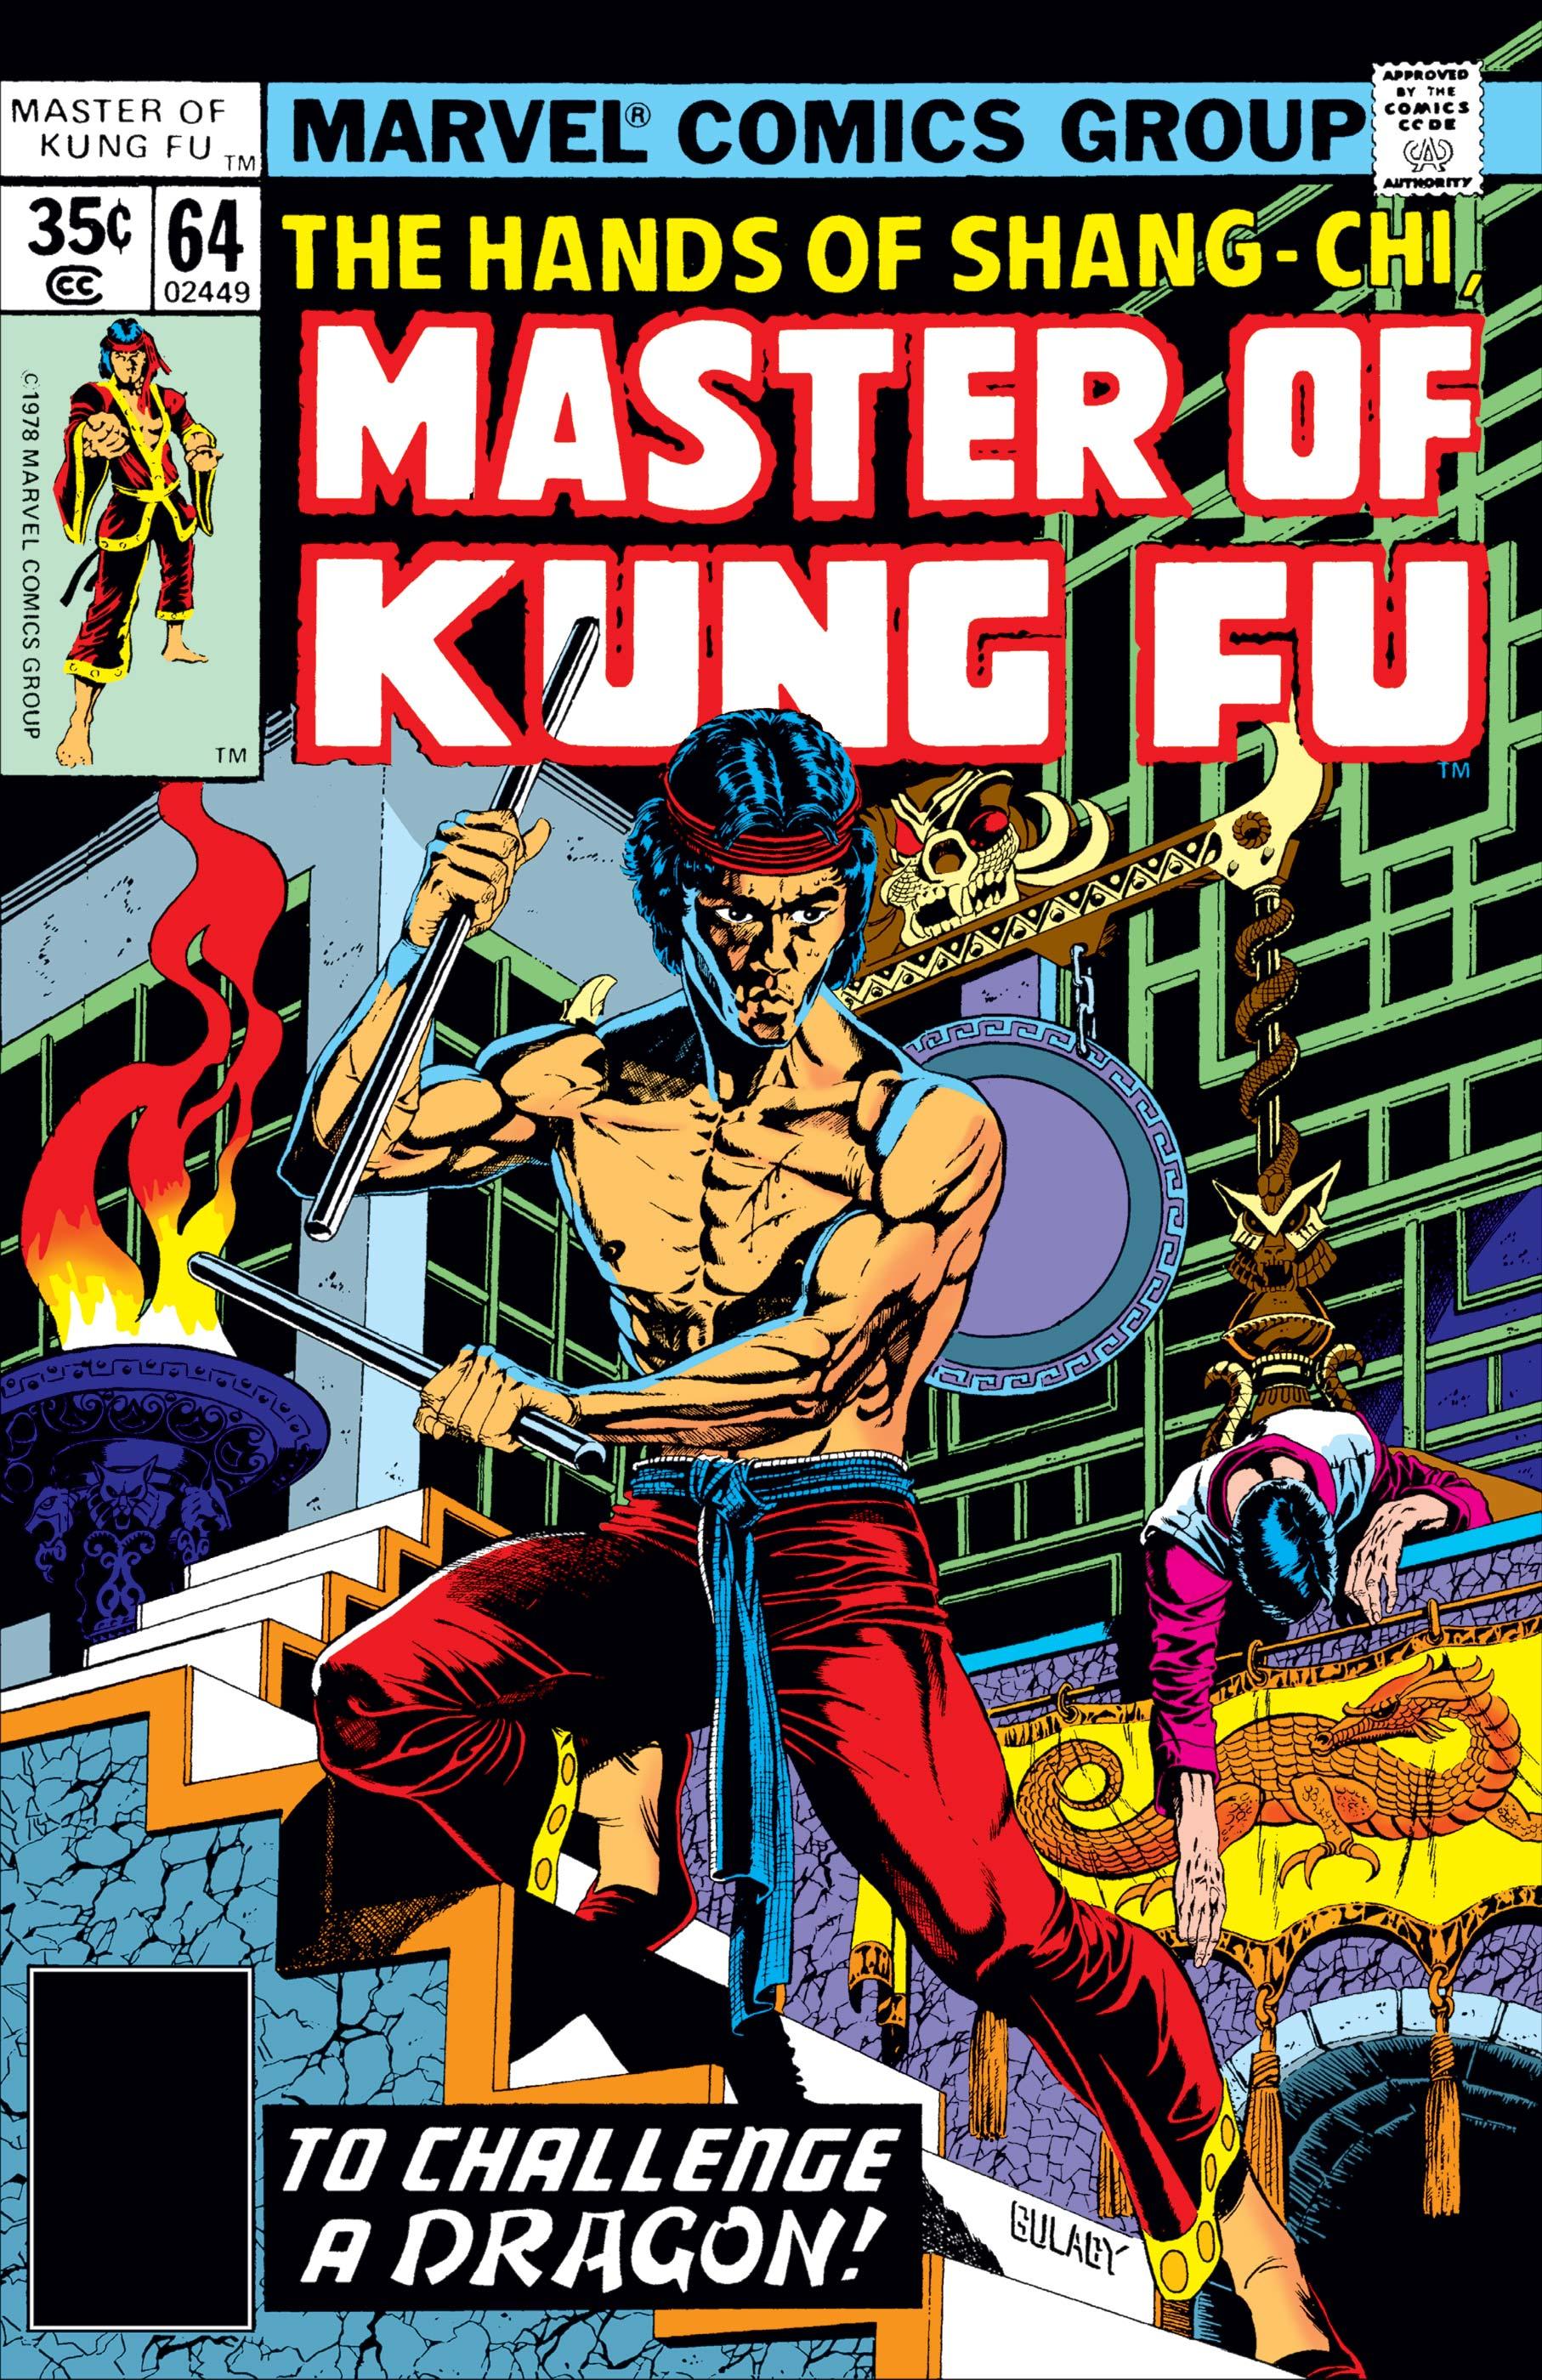 Master of Kung Fu (1974) #64